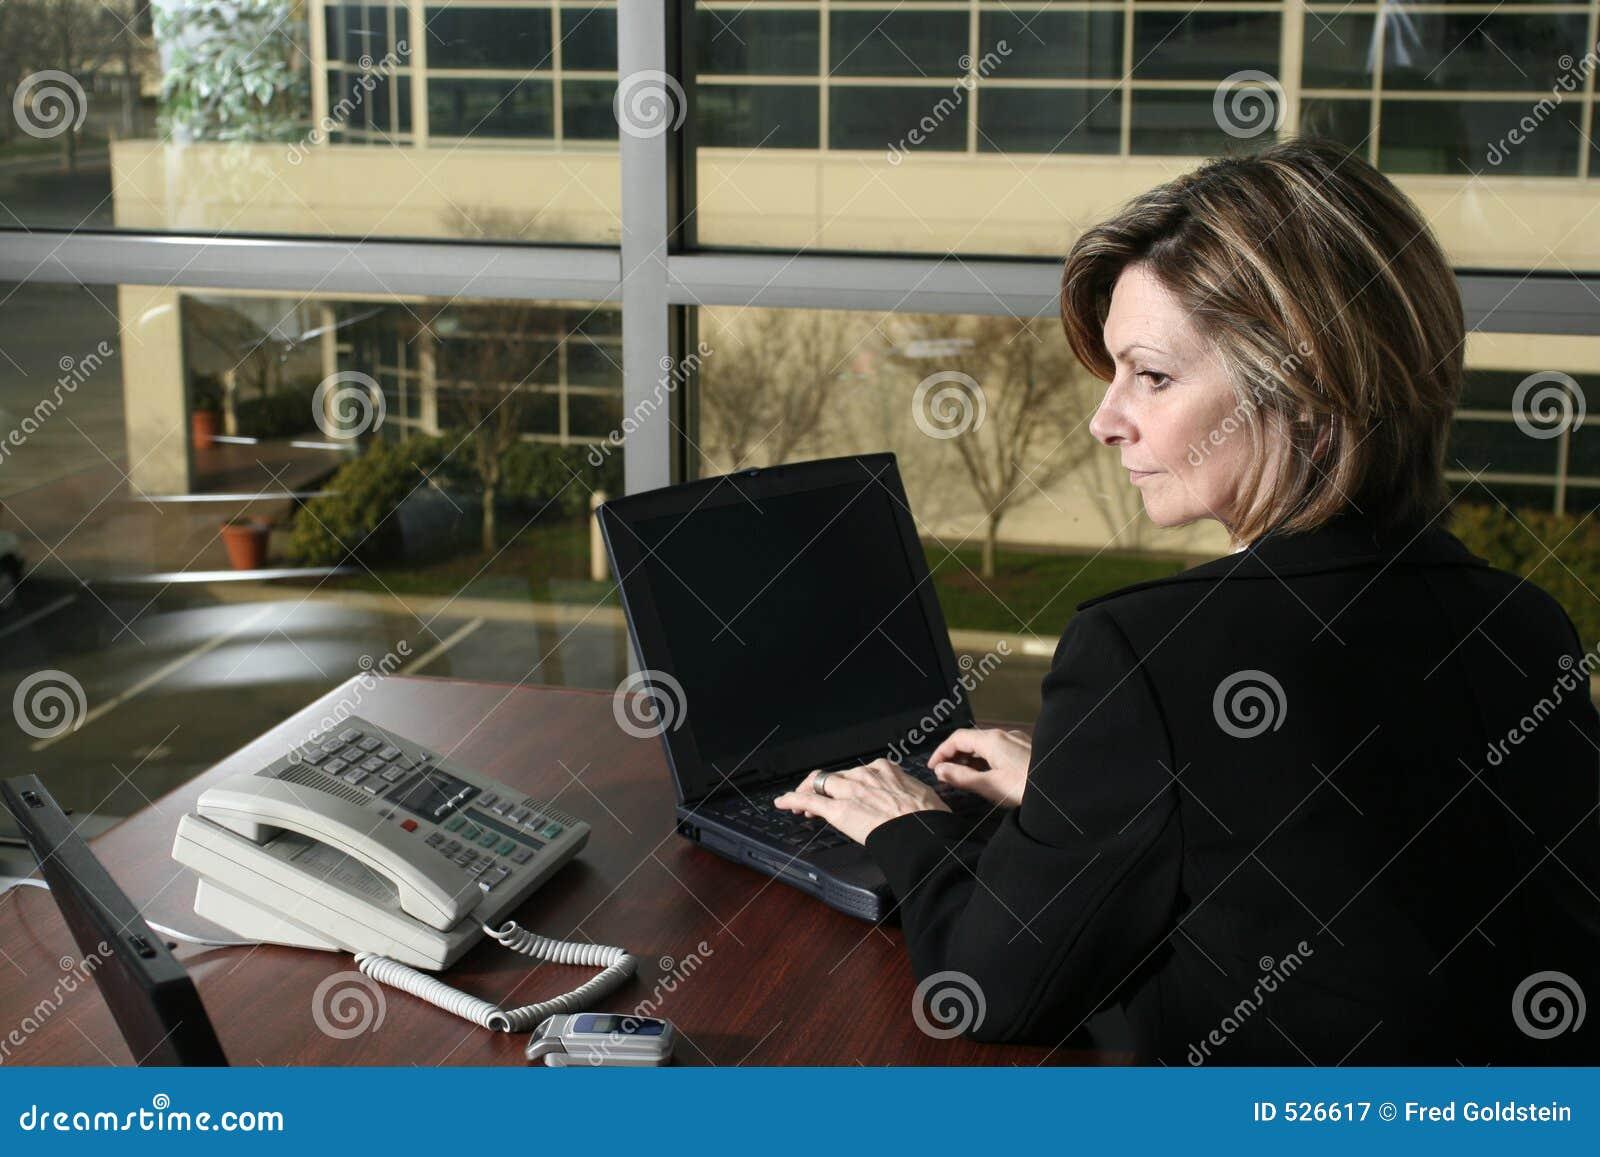 Download 女实业家膝上型计算机 库存图片. 图片 包括有 妇女, 工作, 表达式, 通信, 招待员, 女孩, 键入, 膝上型计算机 - 526617